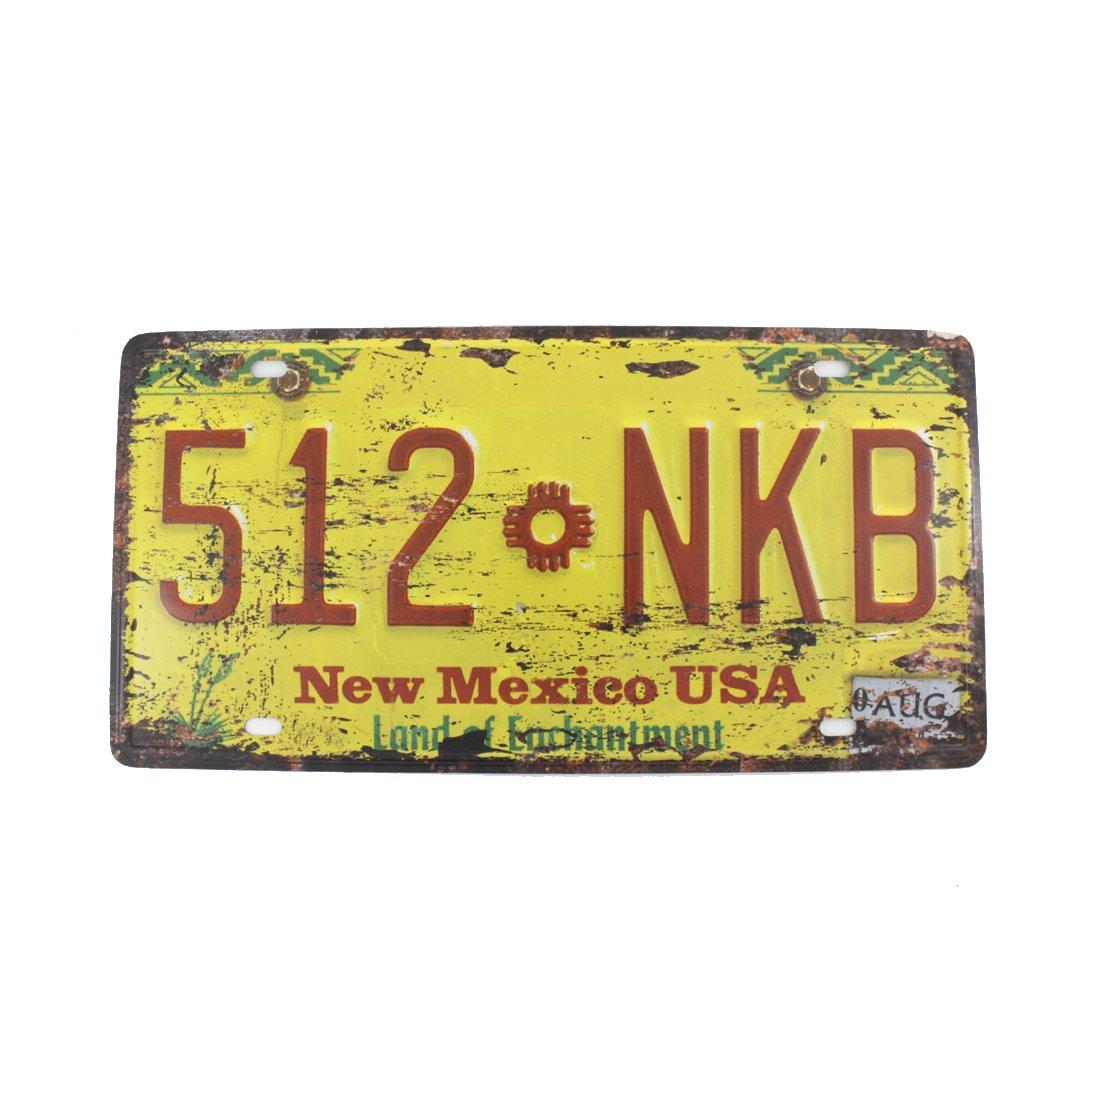 6x12 Inches Vintage Feel Home,bathroom,shop and Bar Wall Decor Souvenir Metal Tin Sign Poster Plaque (New Mexico 512 NKB)